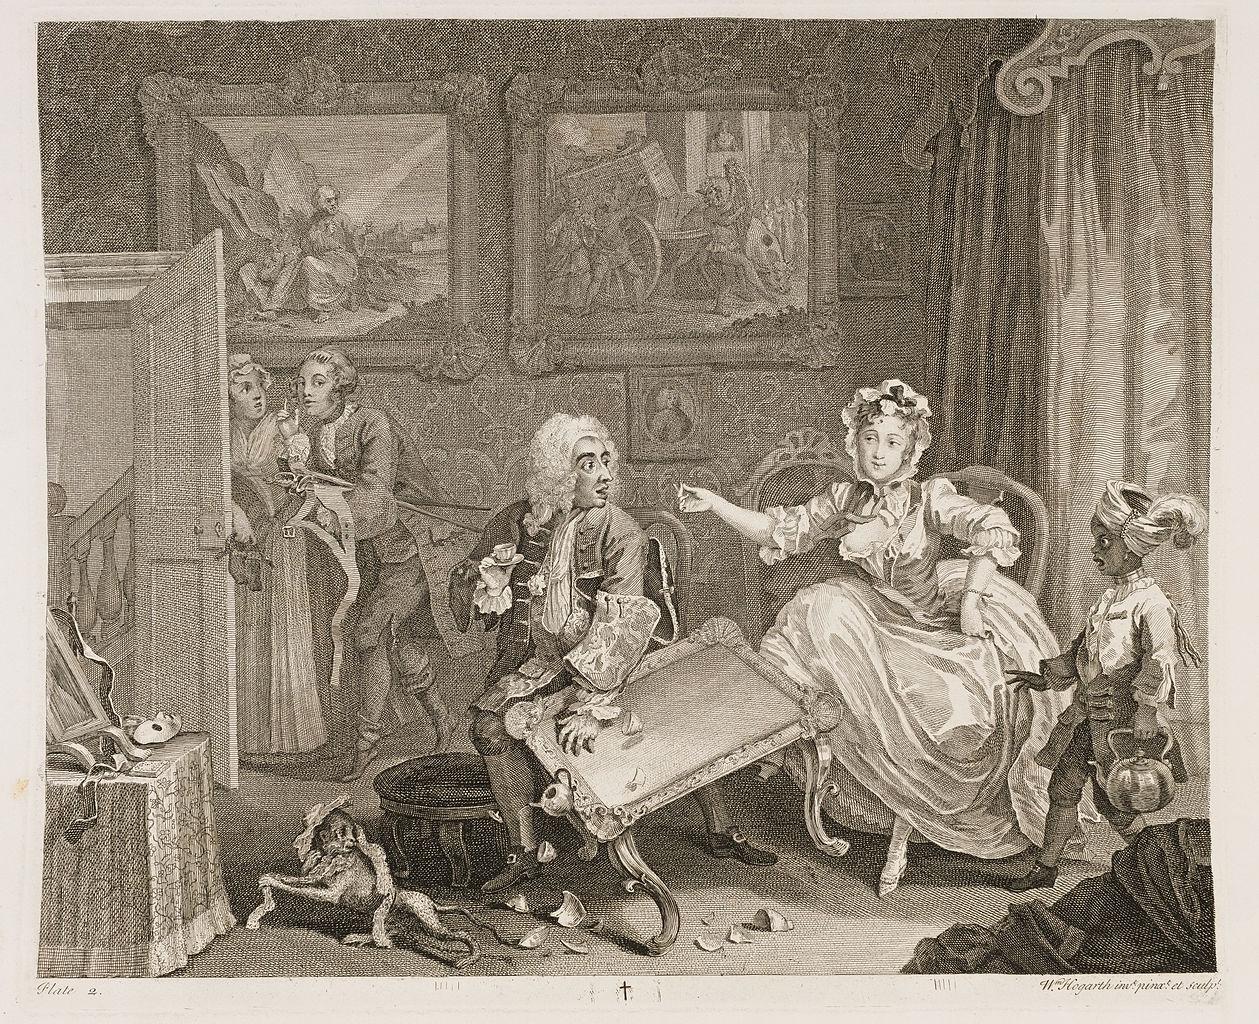 William Hogarth: A Harlot's Progress, Plate 2.